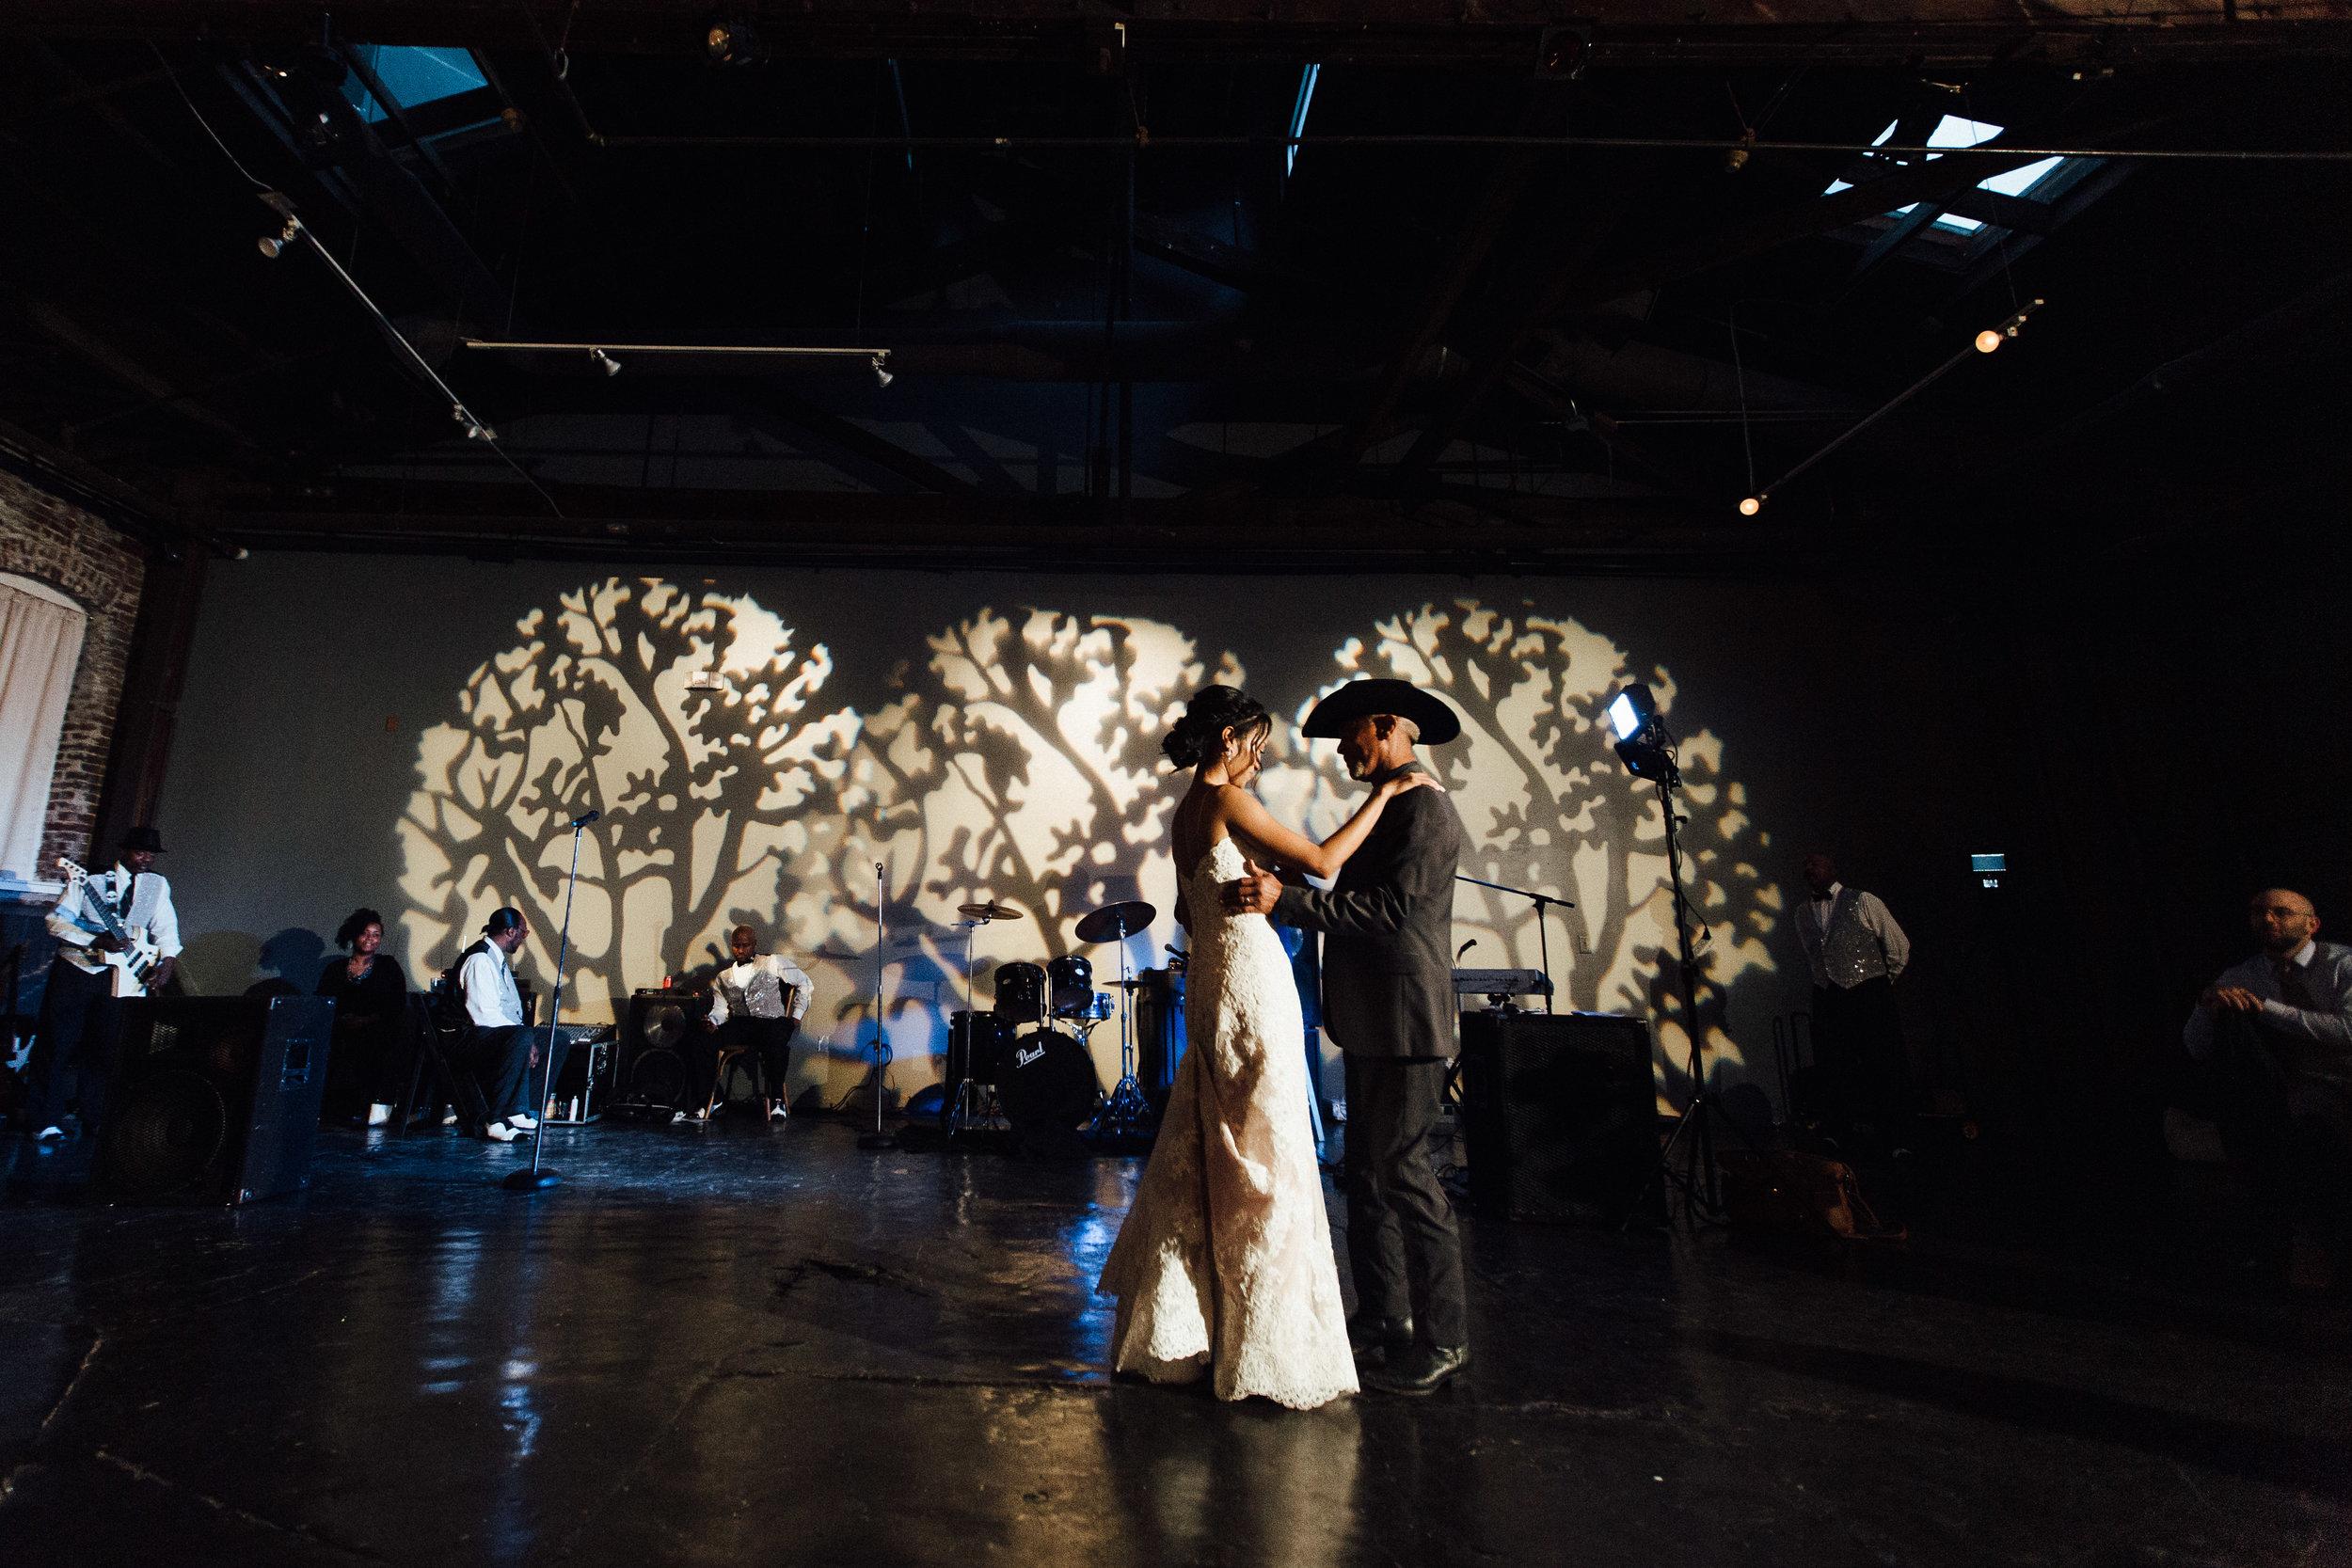 king_plow_atlanta_wedding_art_gallery_modern_lifestyle_documentary_1901.jpg